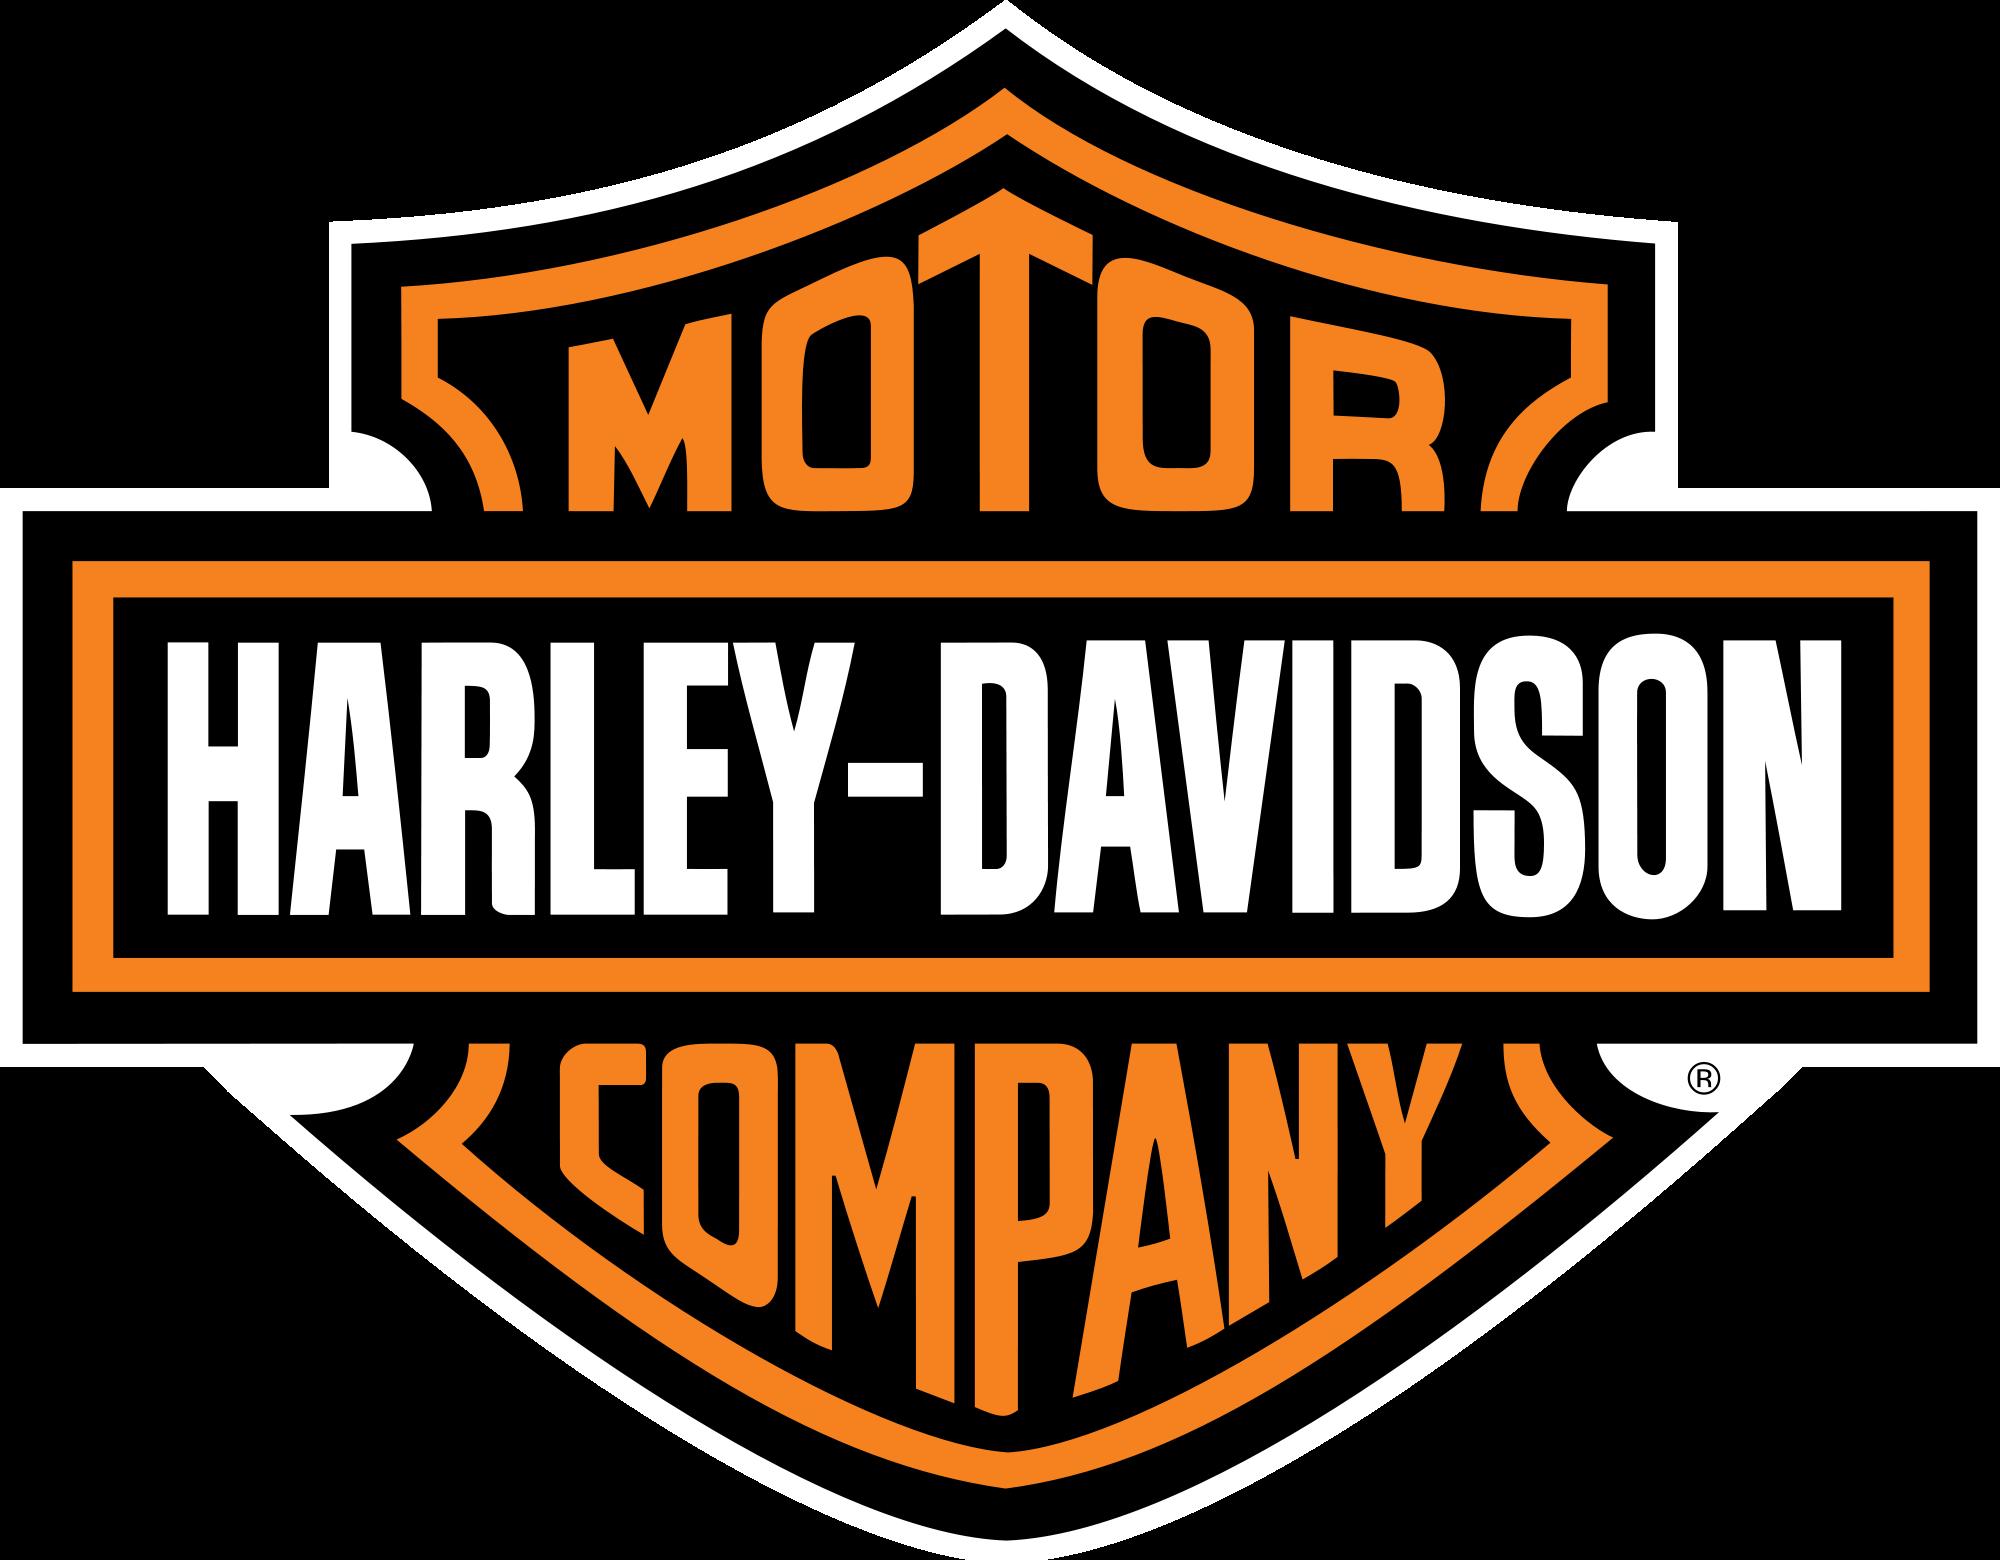 Harley Davidson PNG - 11030